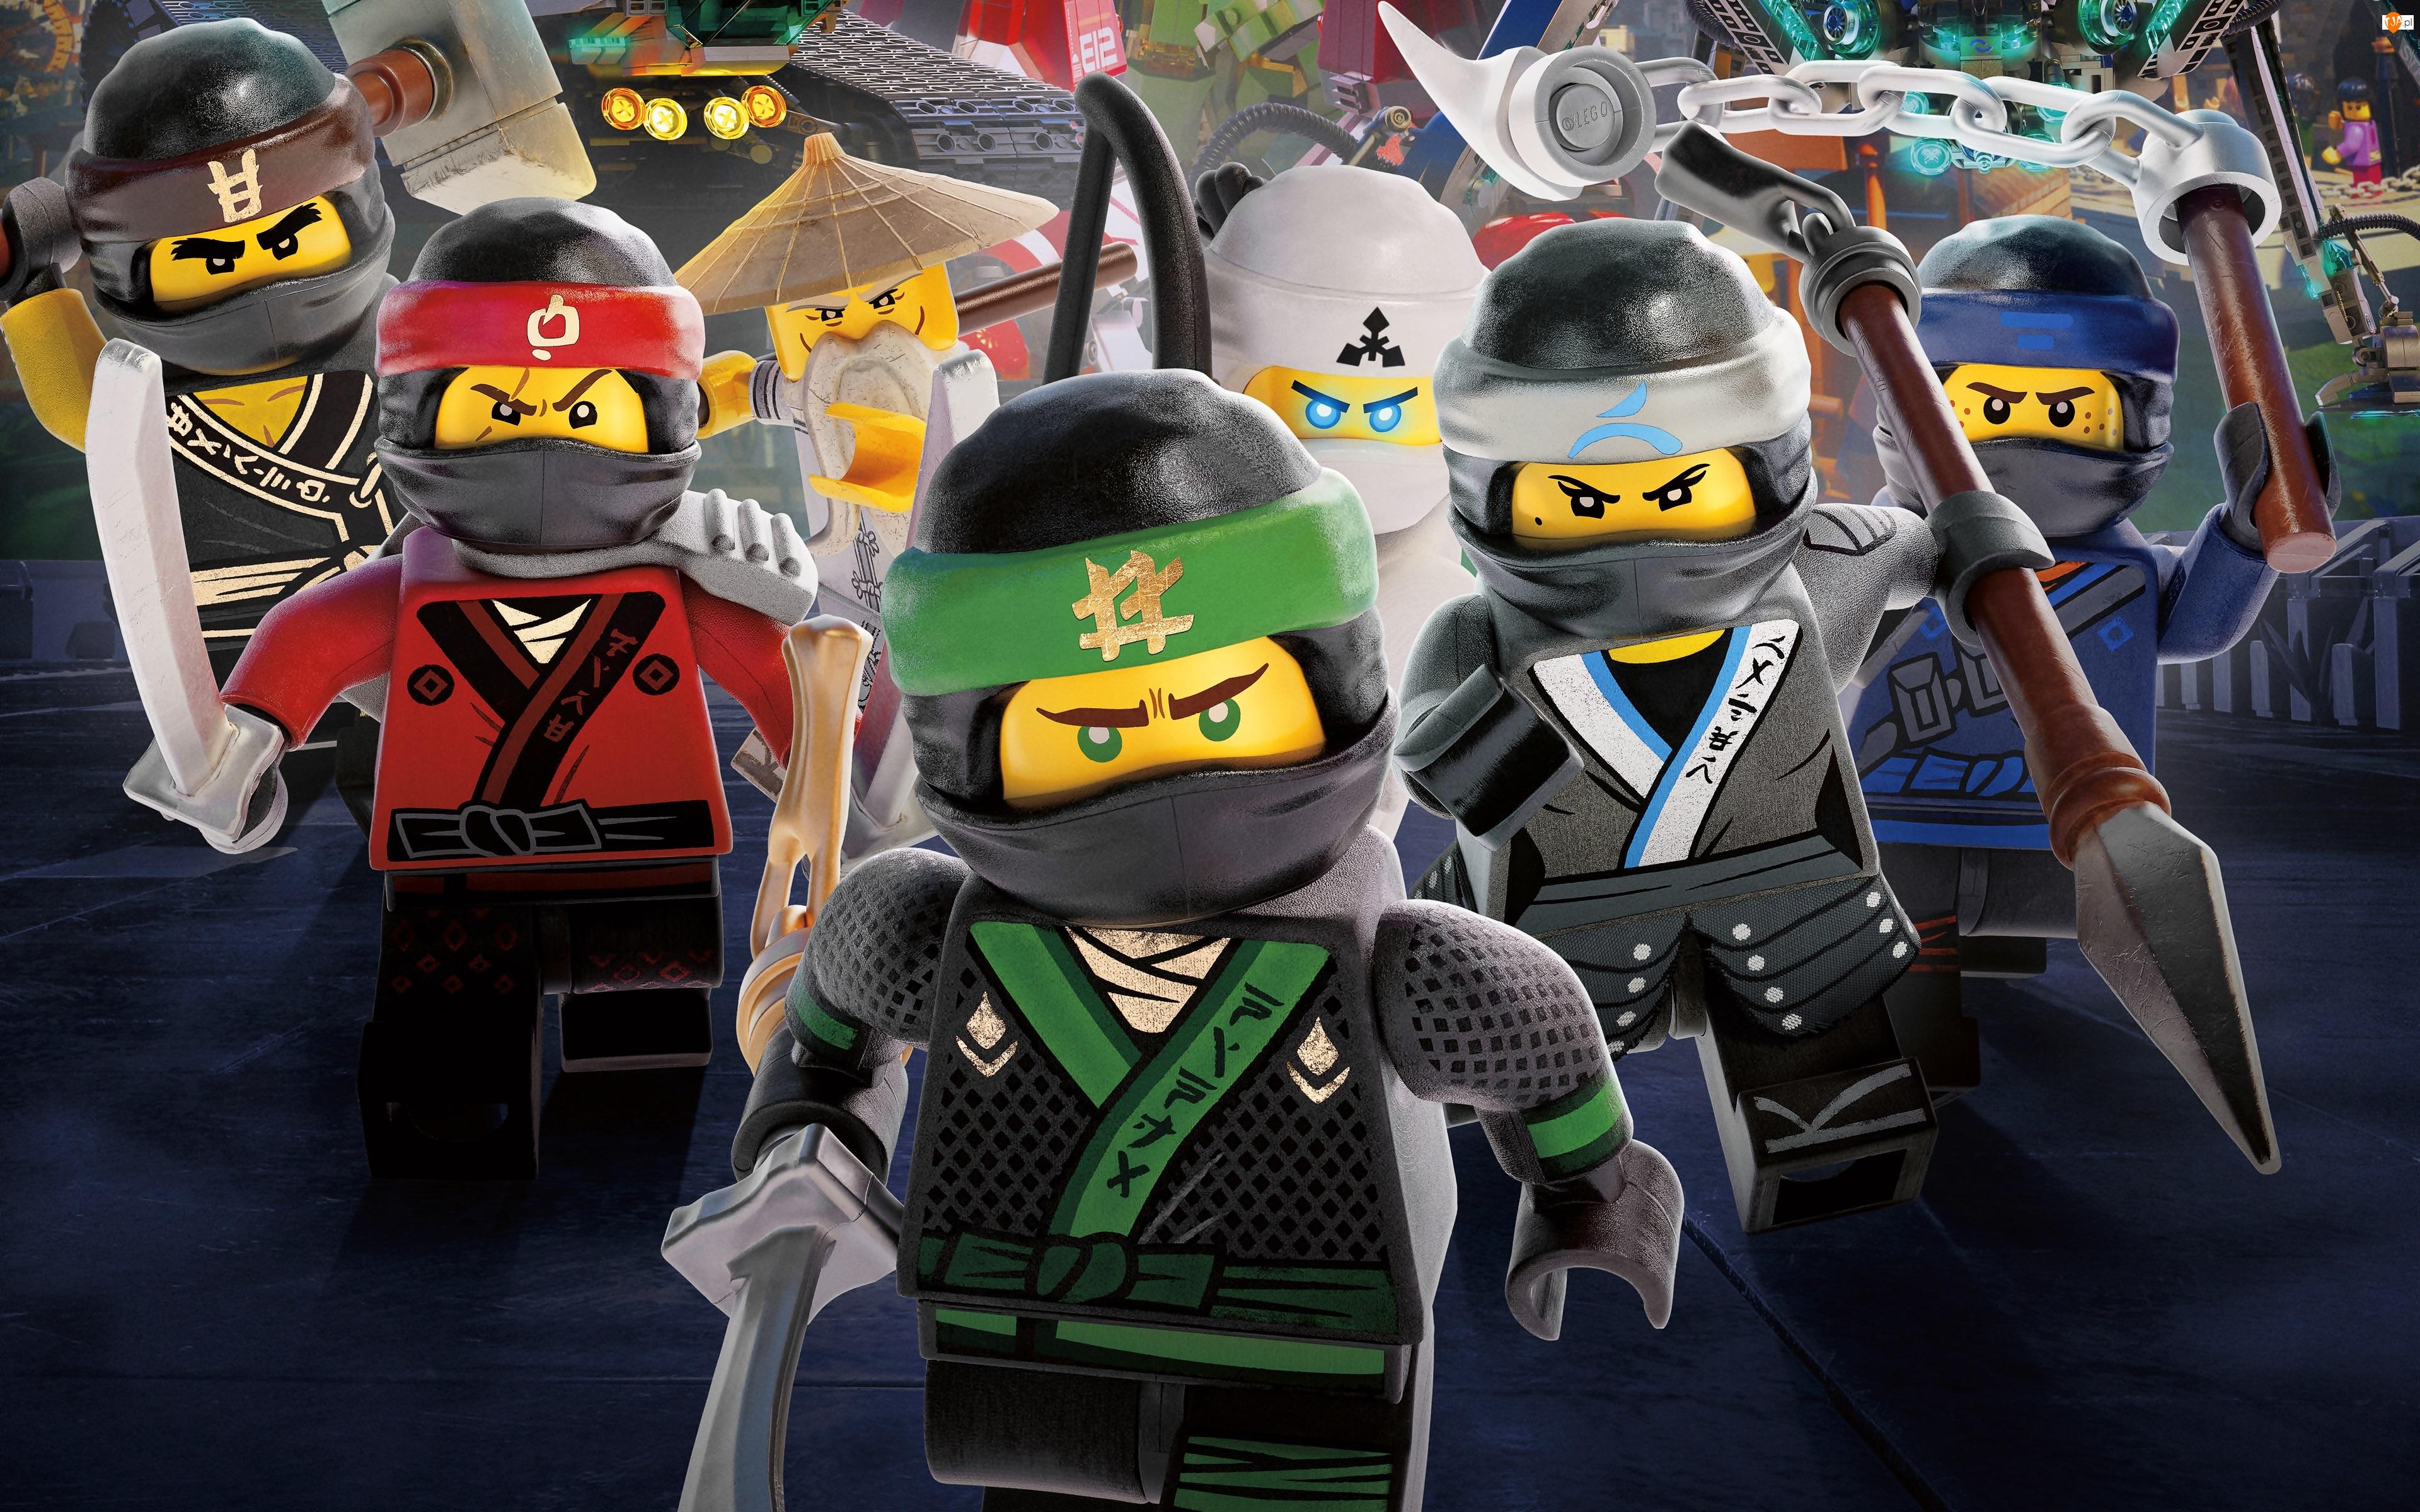 Plakat, LEGO Ninjago: Film, The LEGO Ninjago: Movie